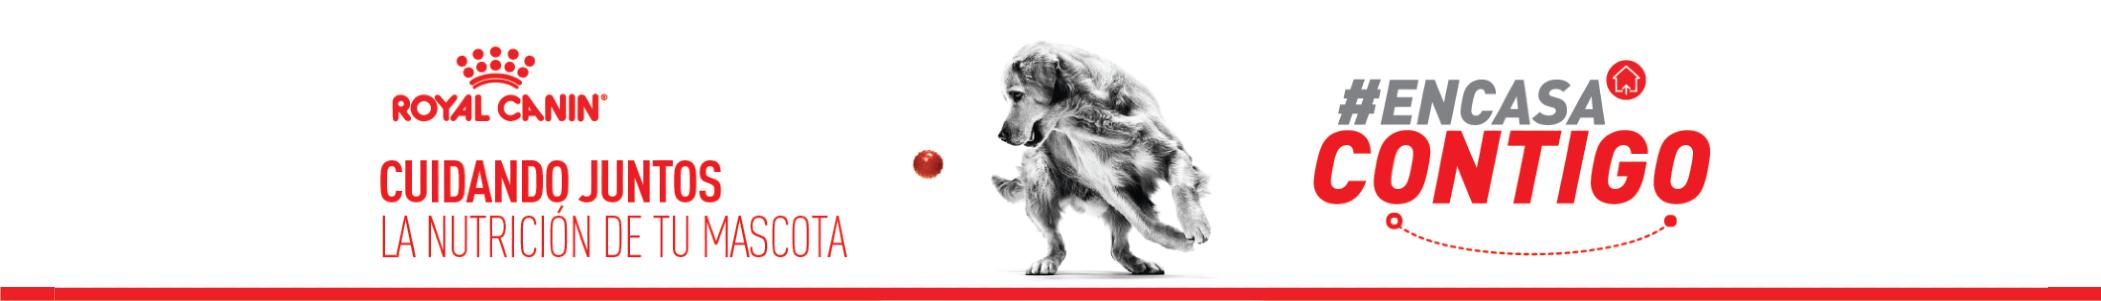 Royal Canin Promo